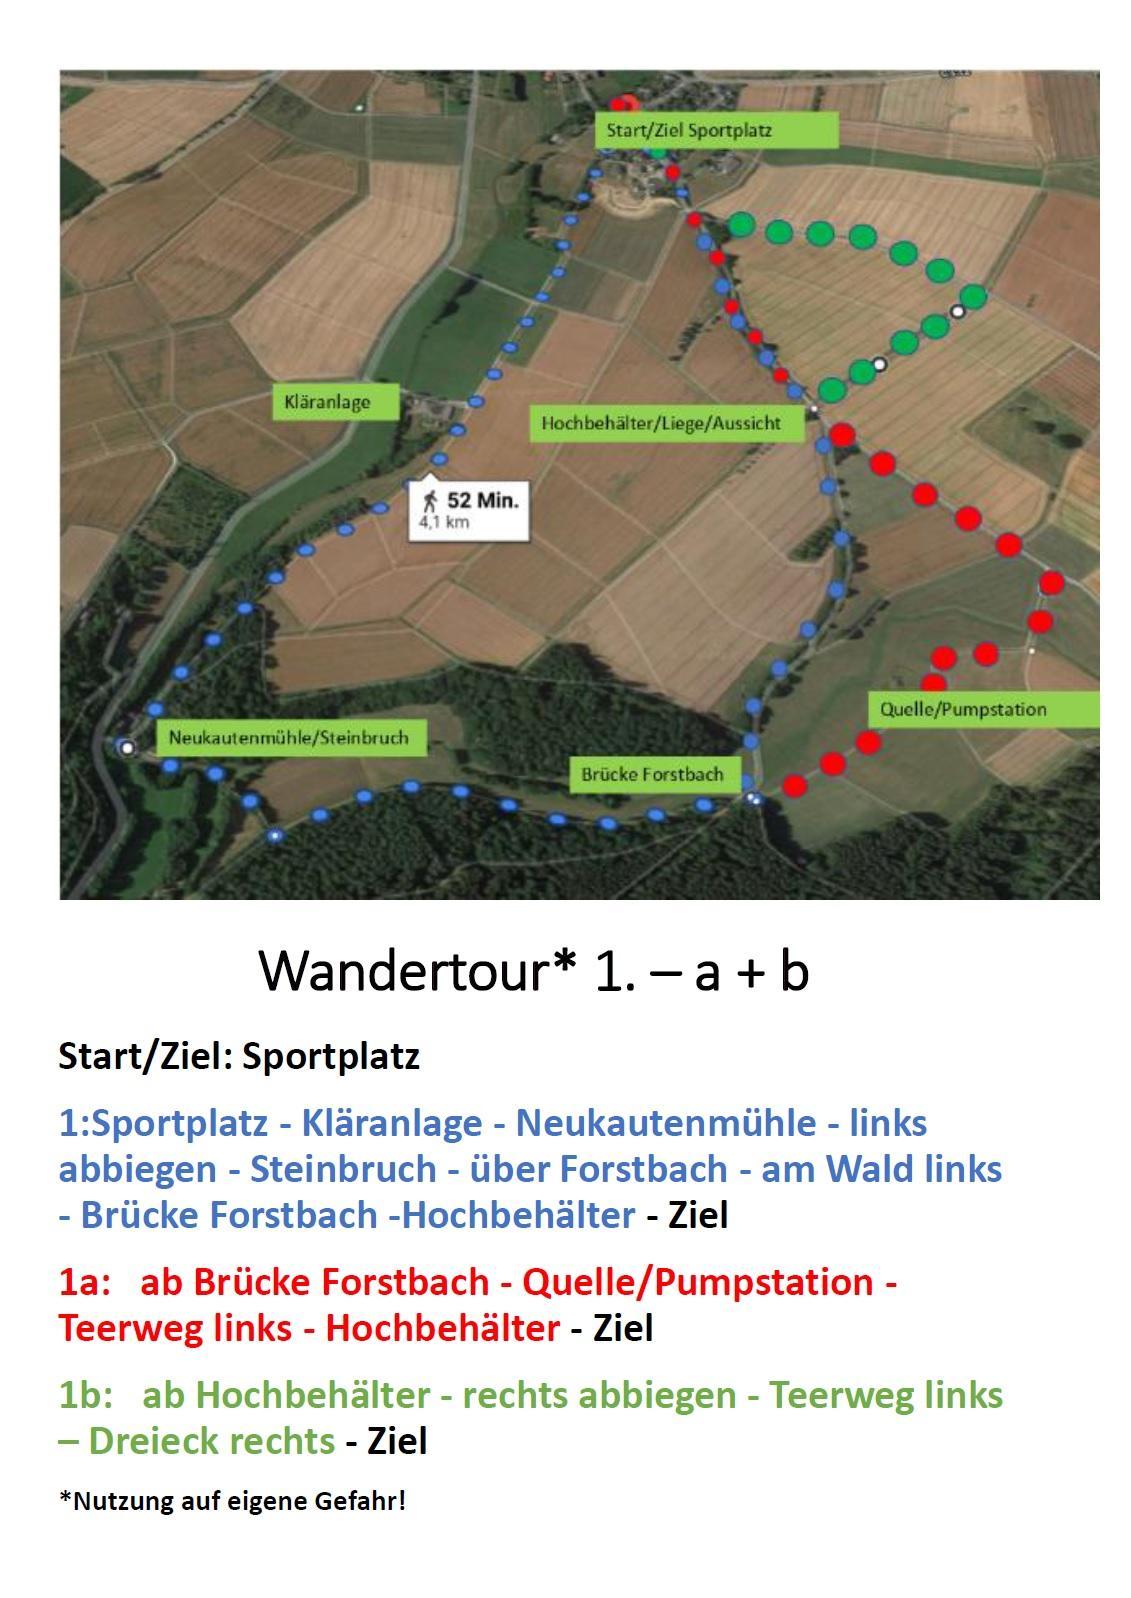 Wandertour 1